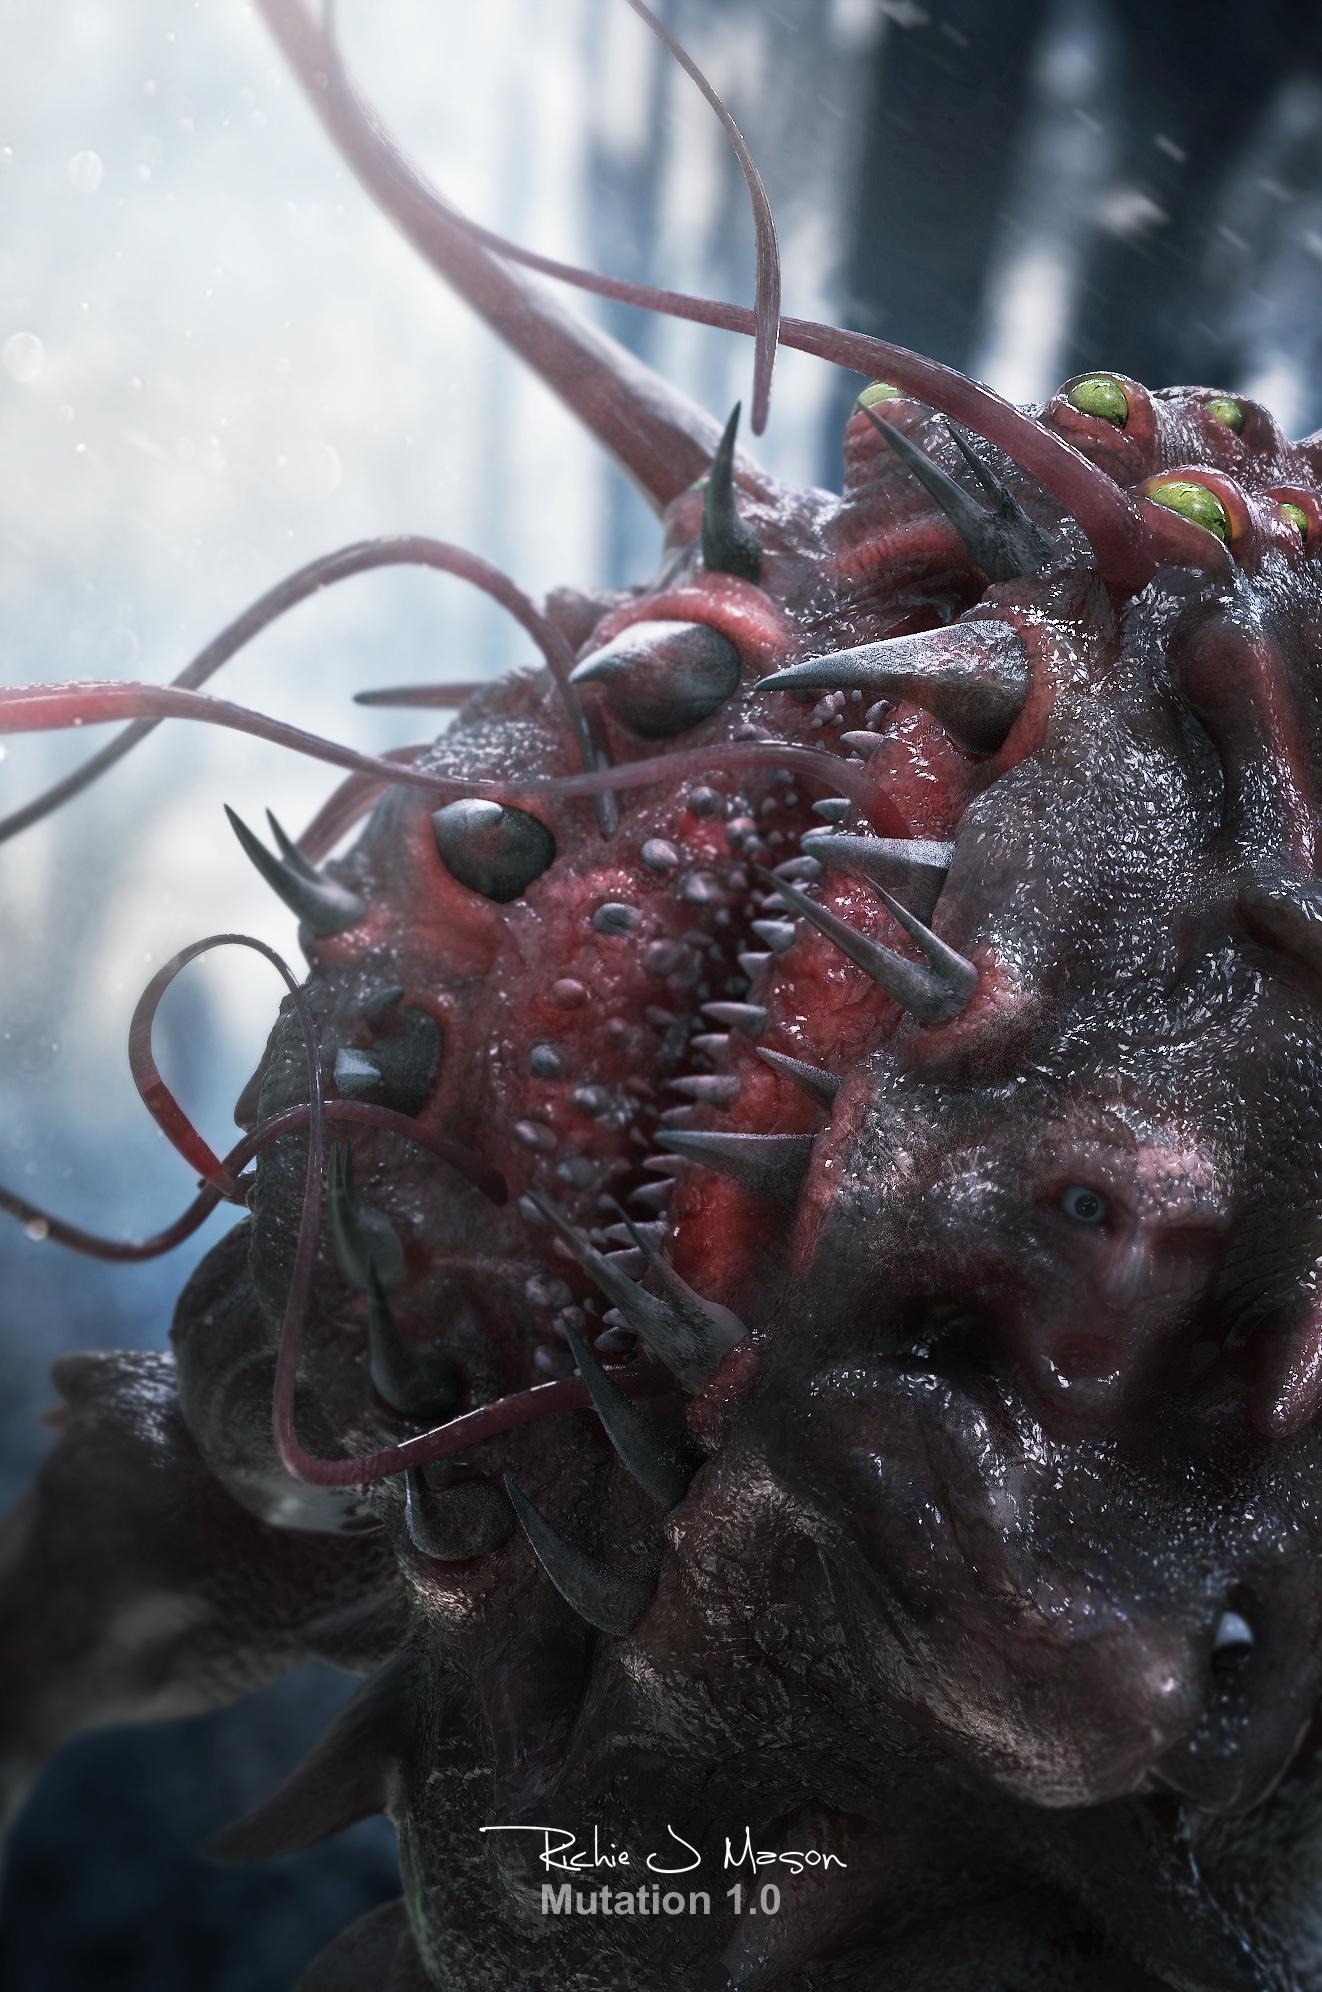 Richenks mutation 1 dot 0 1 b4ce8f44 qxyy